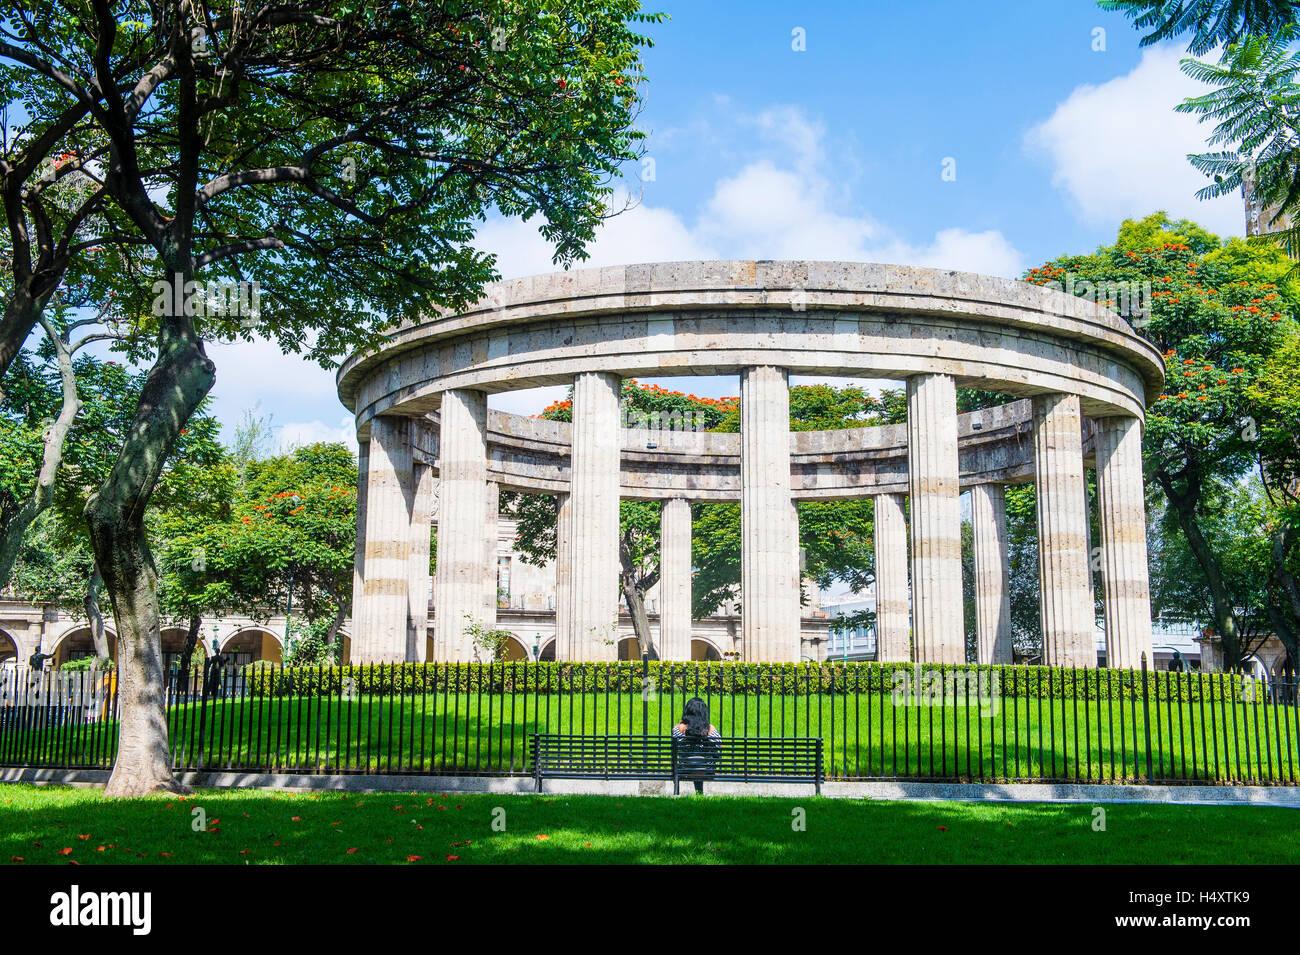 GUADALAJARA , MEXICO - AUG 29 : The Rotonda de los Jaliscienses Ilustres in Guadalajara Mexico on August 29 2016. - Stock Image